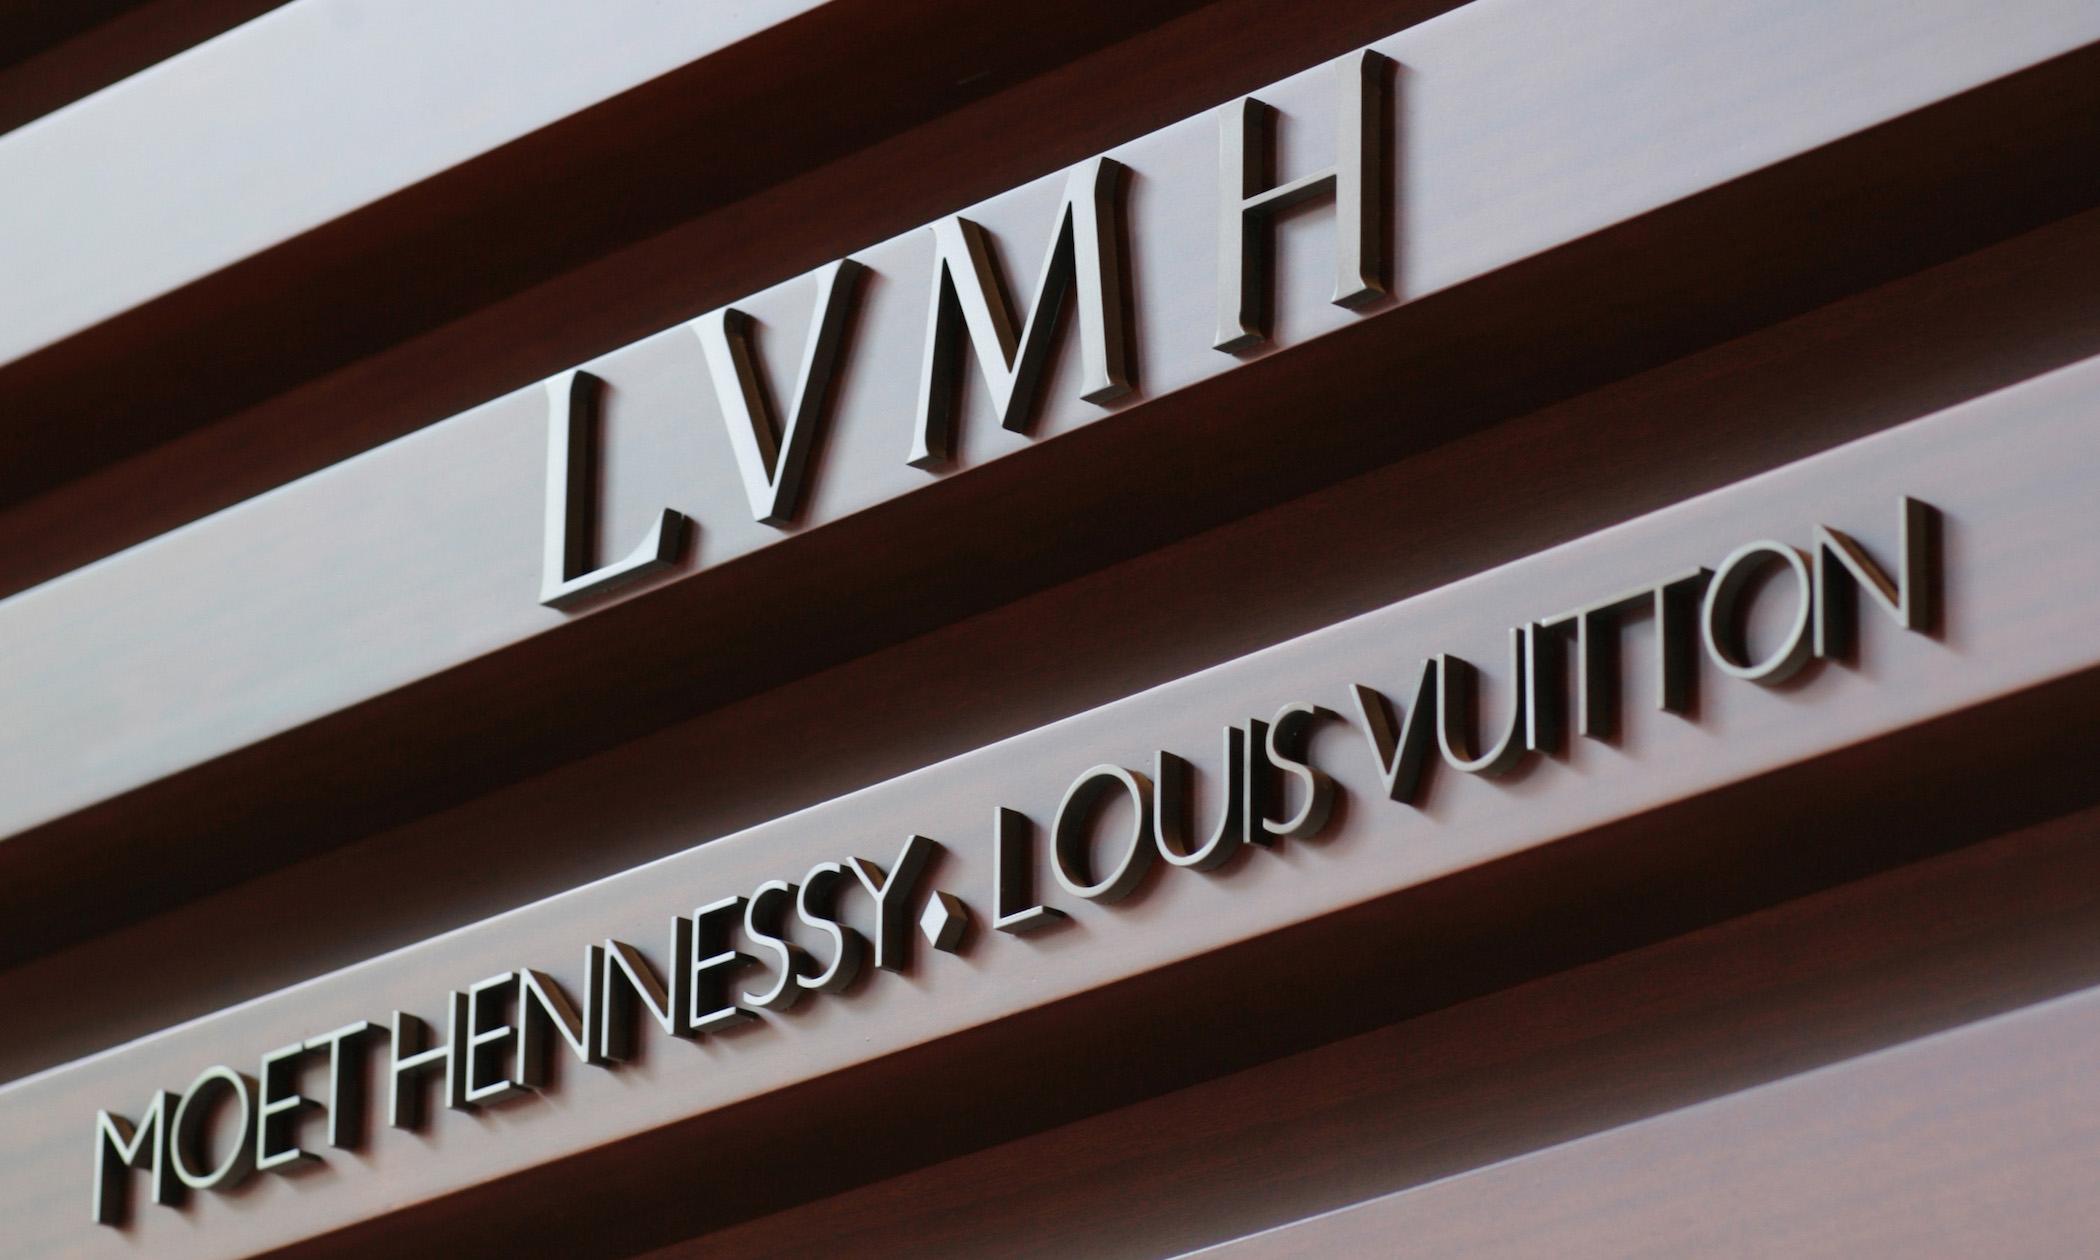 Louis Vuitton 拟在法国增设生产岗位以应对中国消费需求